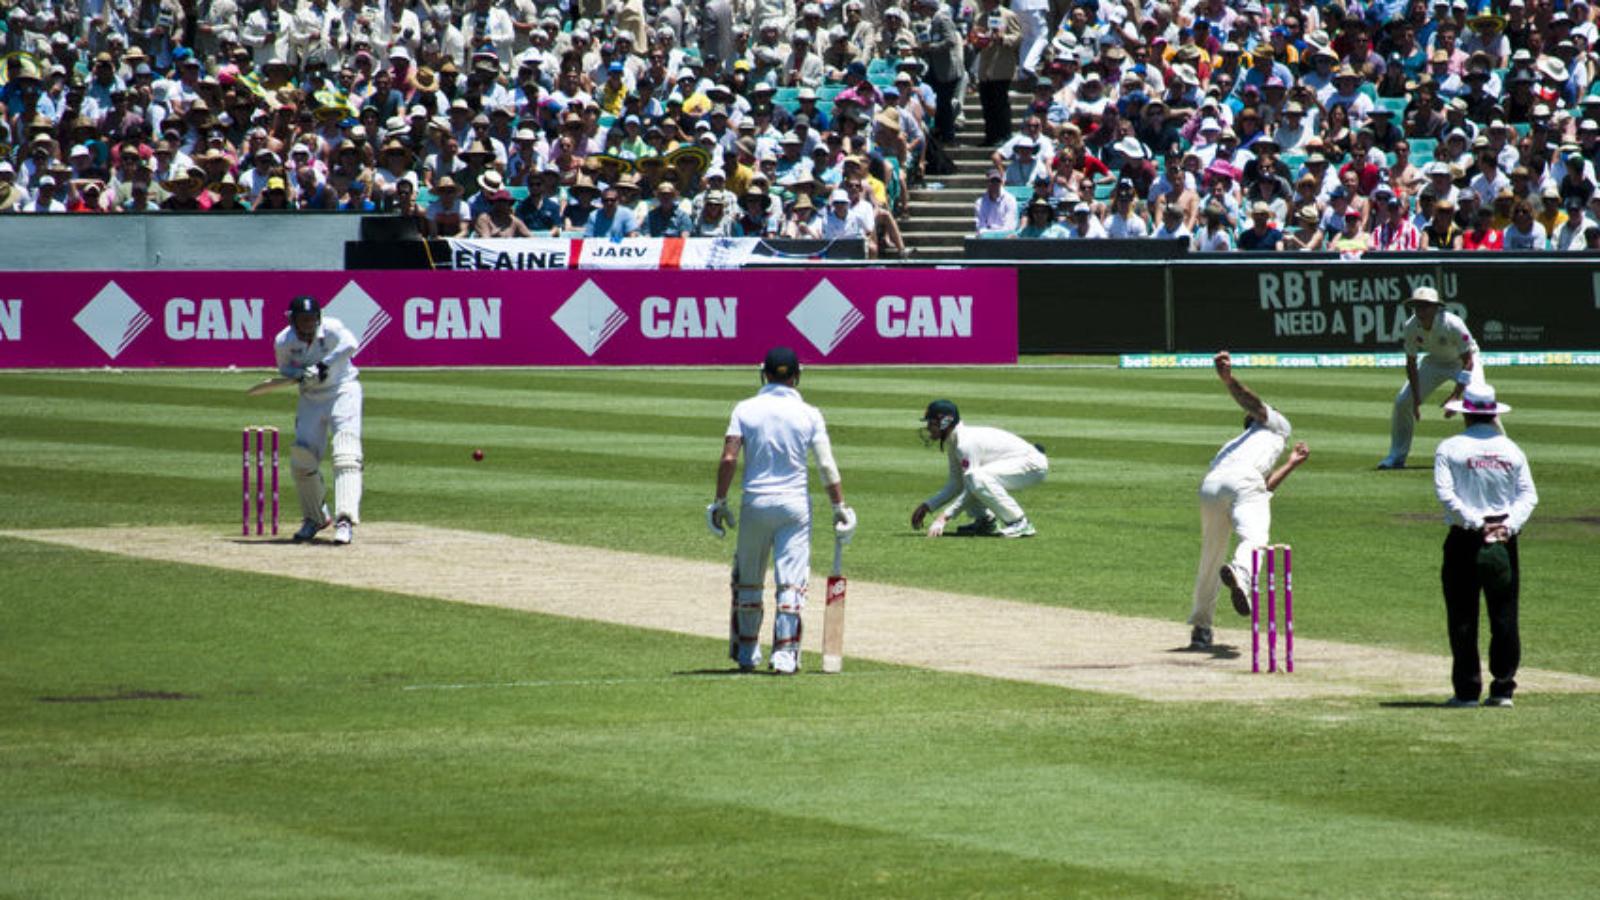 35881565 - sydney,australia - january 4: australias nathan lyon bowls on the last ashes test match at sydney cricket ground,australia on january 4, 2014